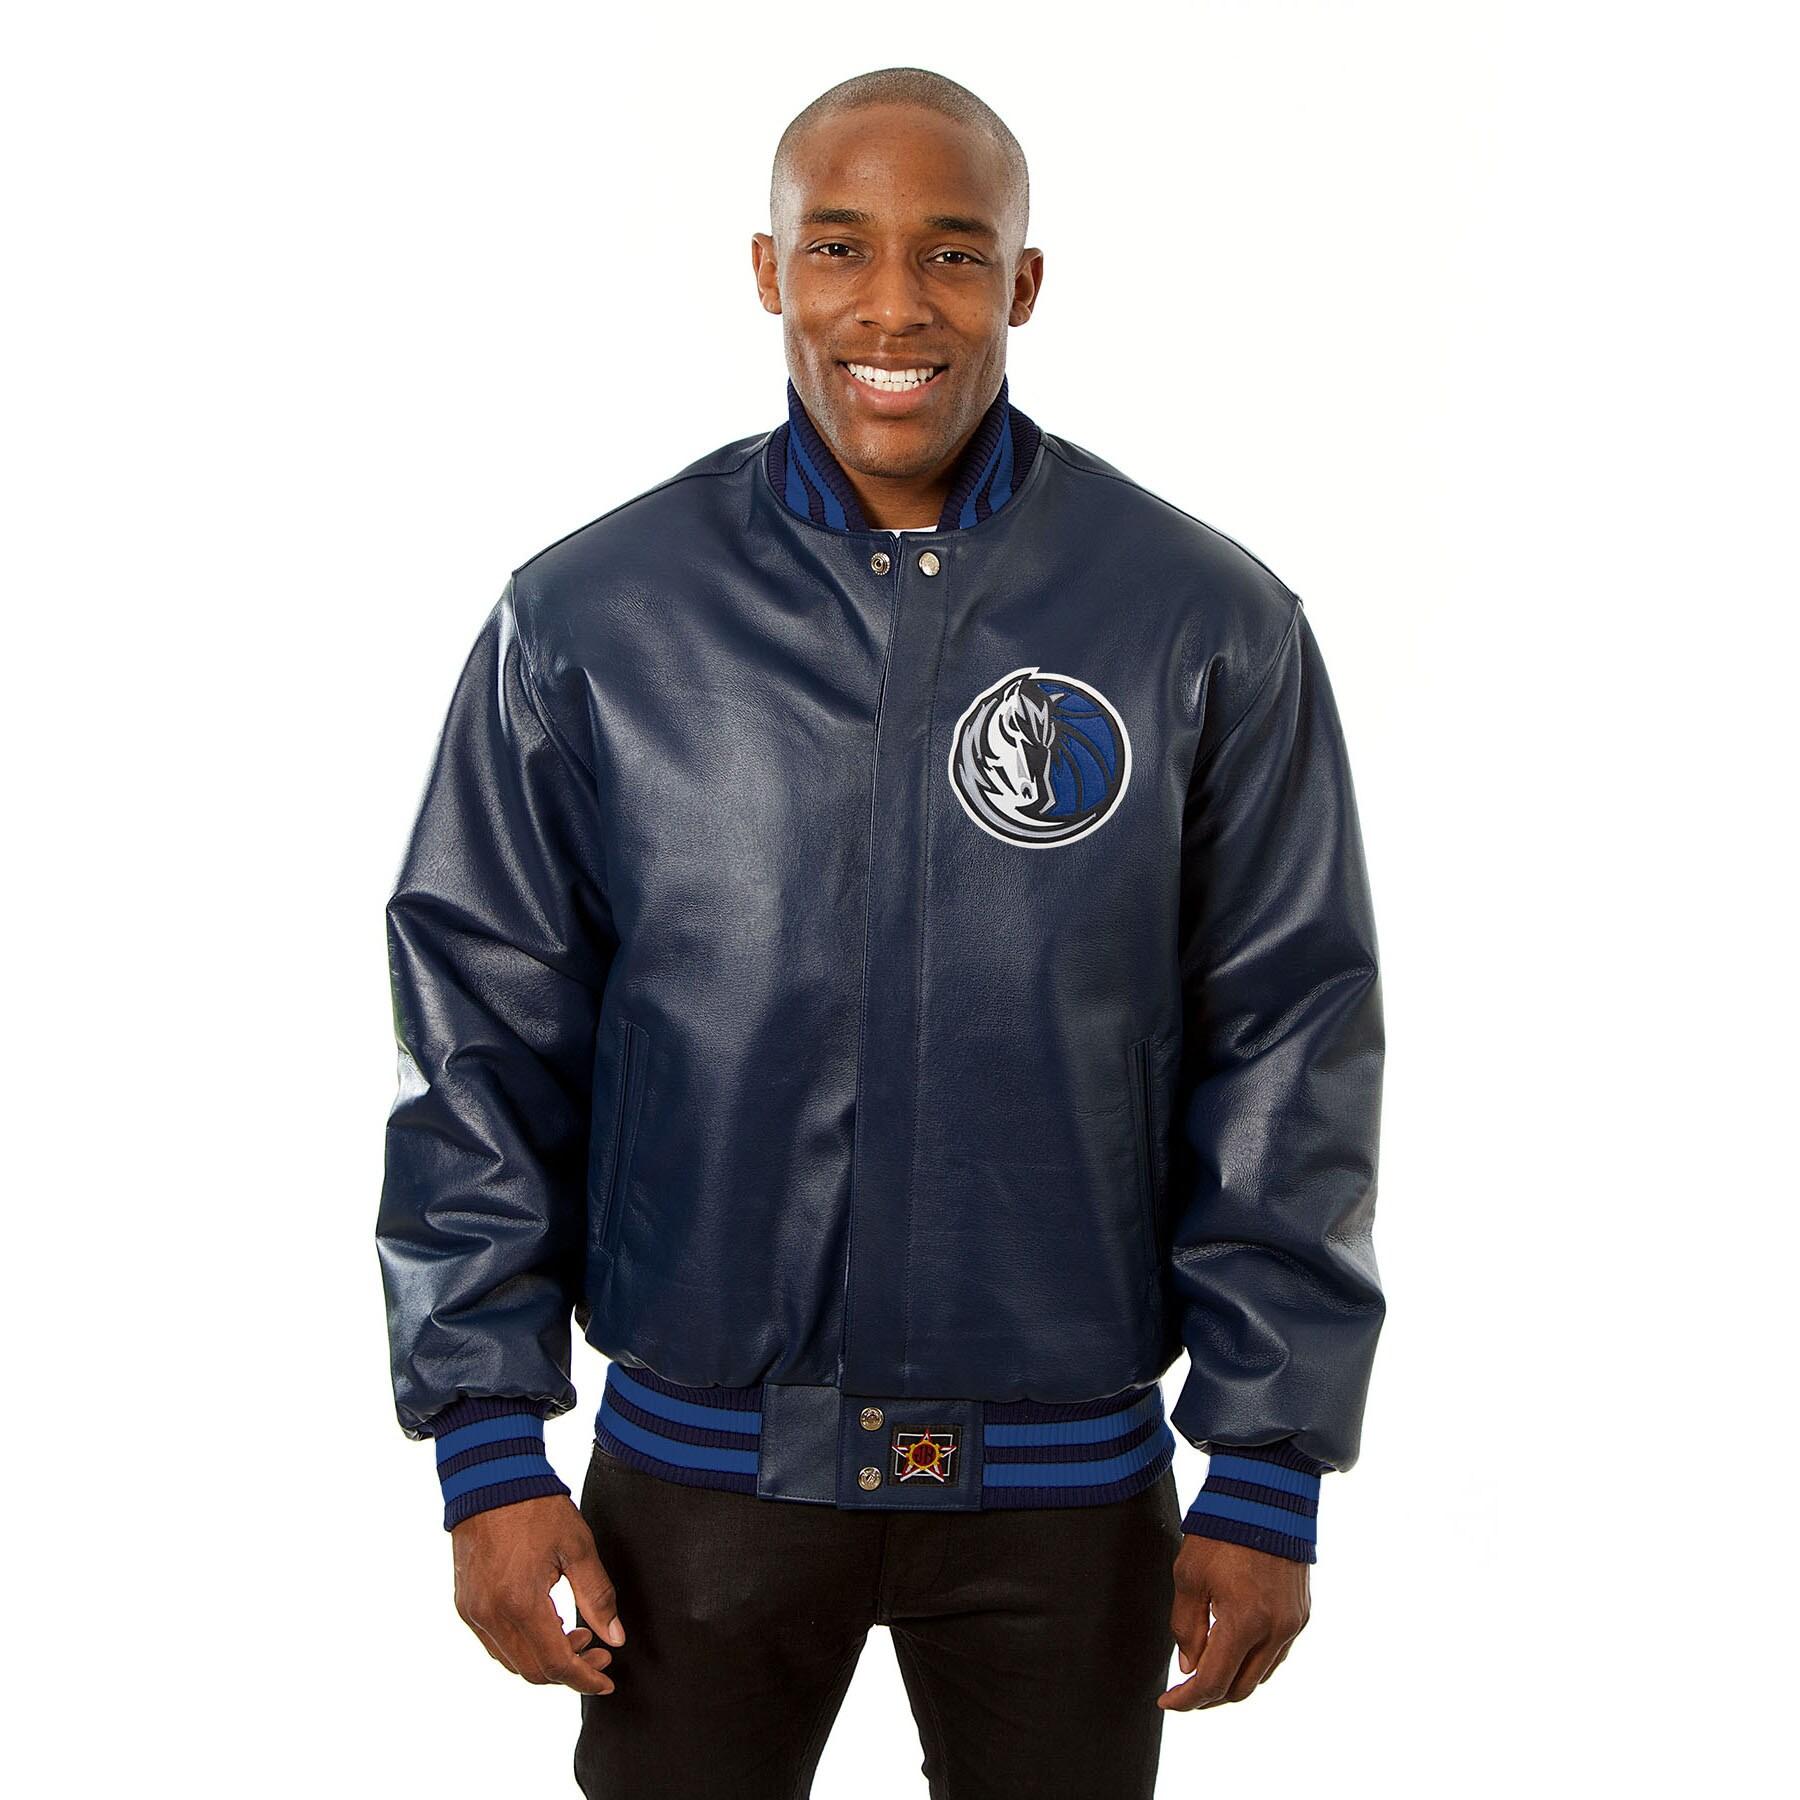 Dallas Mavericks JH Design Domestic Team Color Leather Jacket - Navy